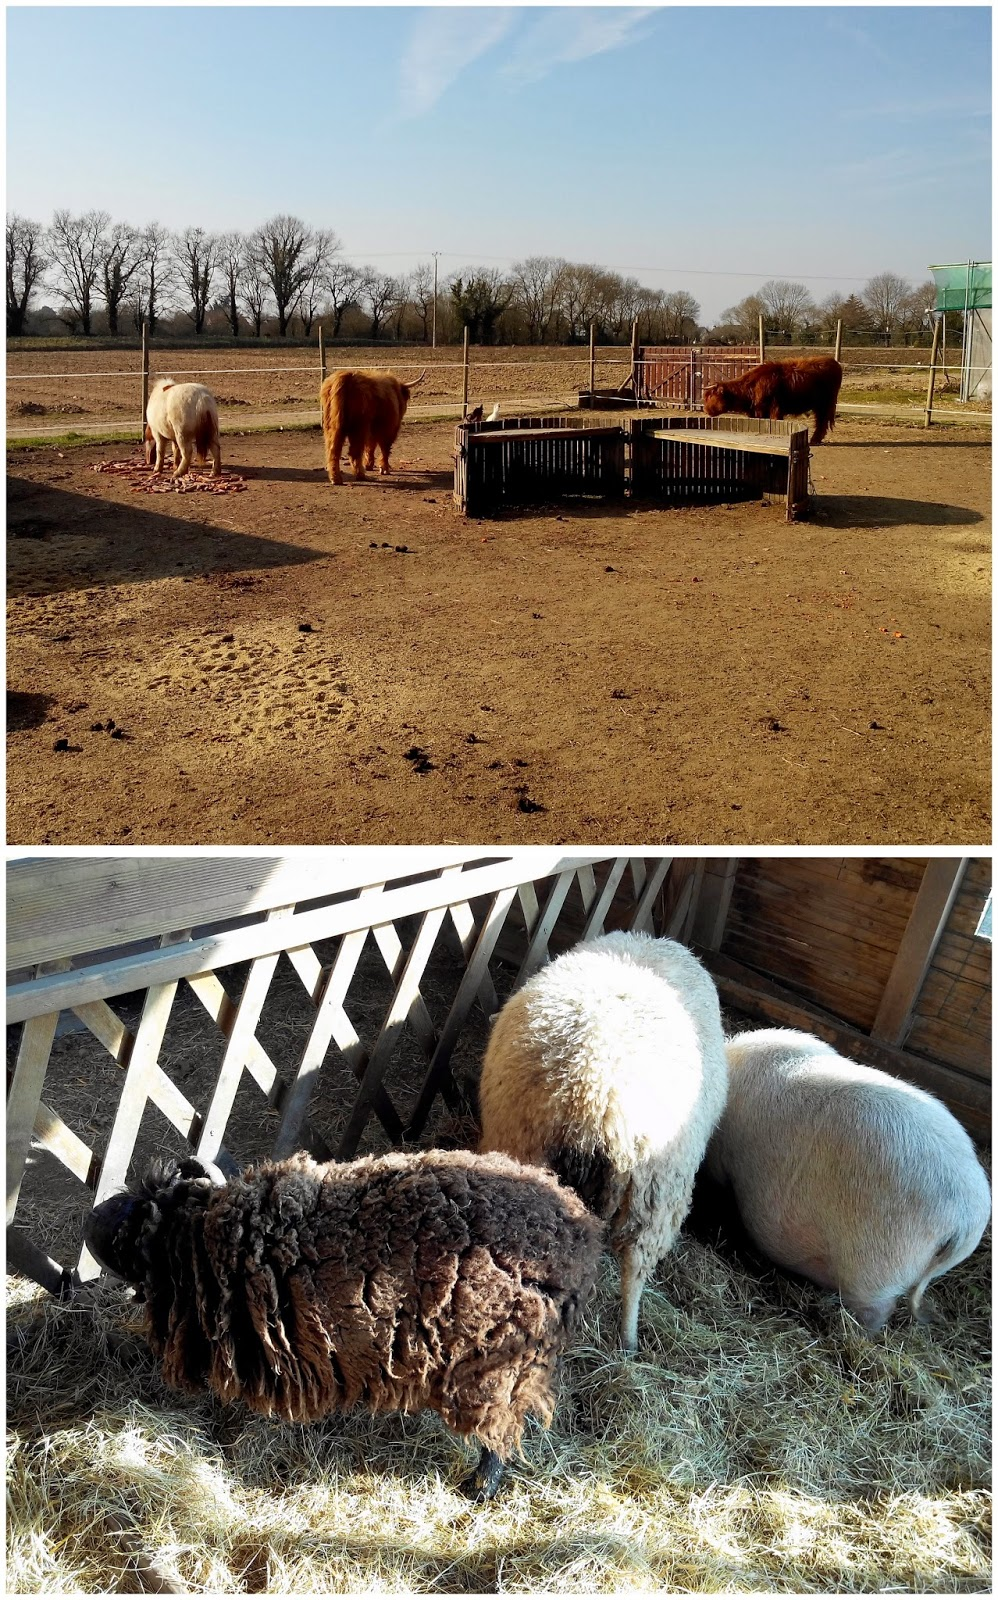 ferme, ferme de la chasseloire, st herblain, mouton, chèvre, bullelodie